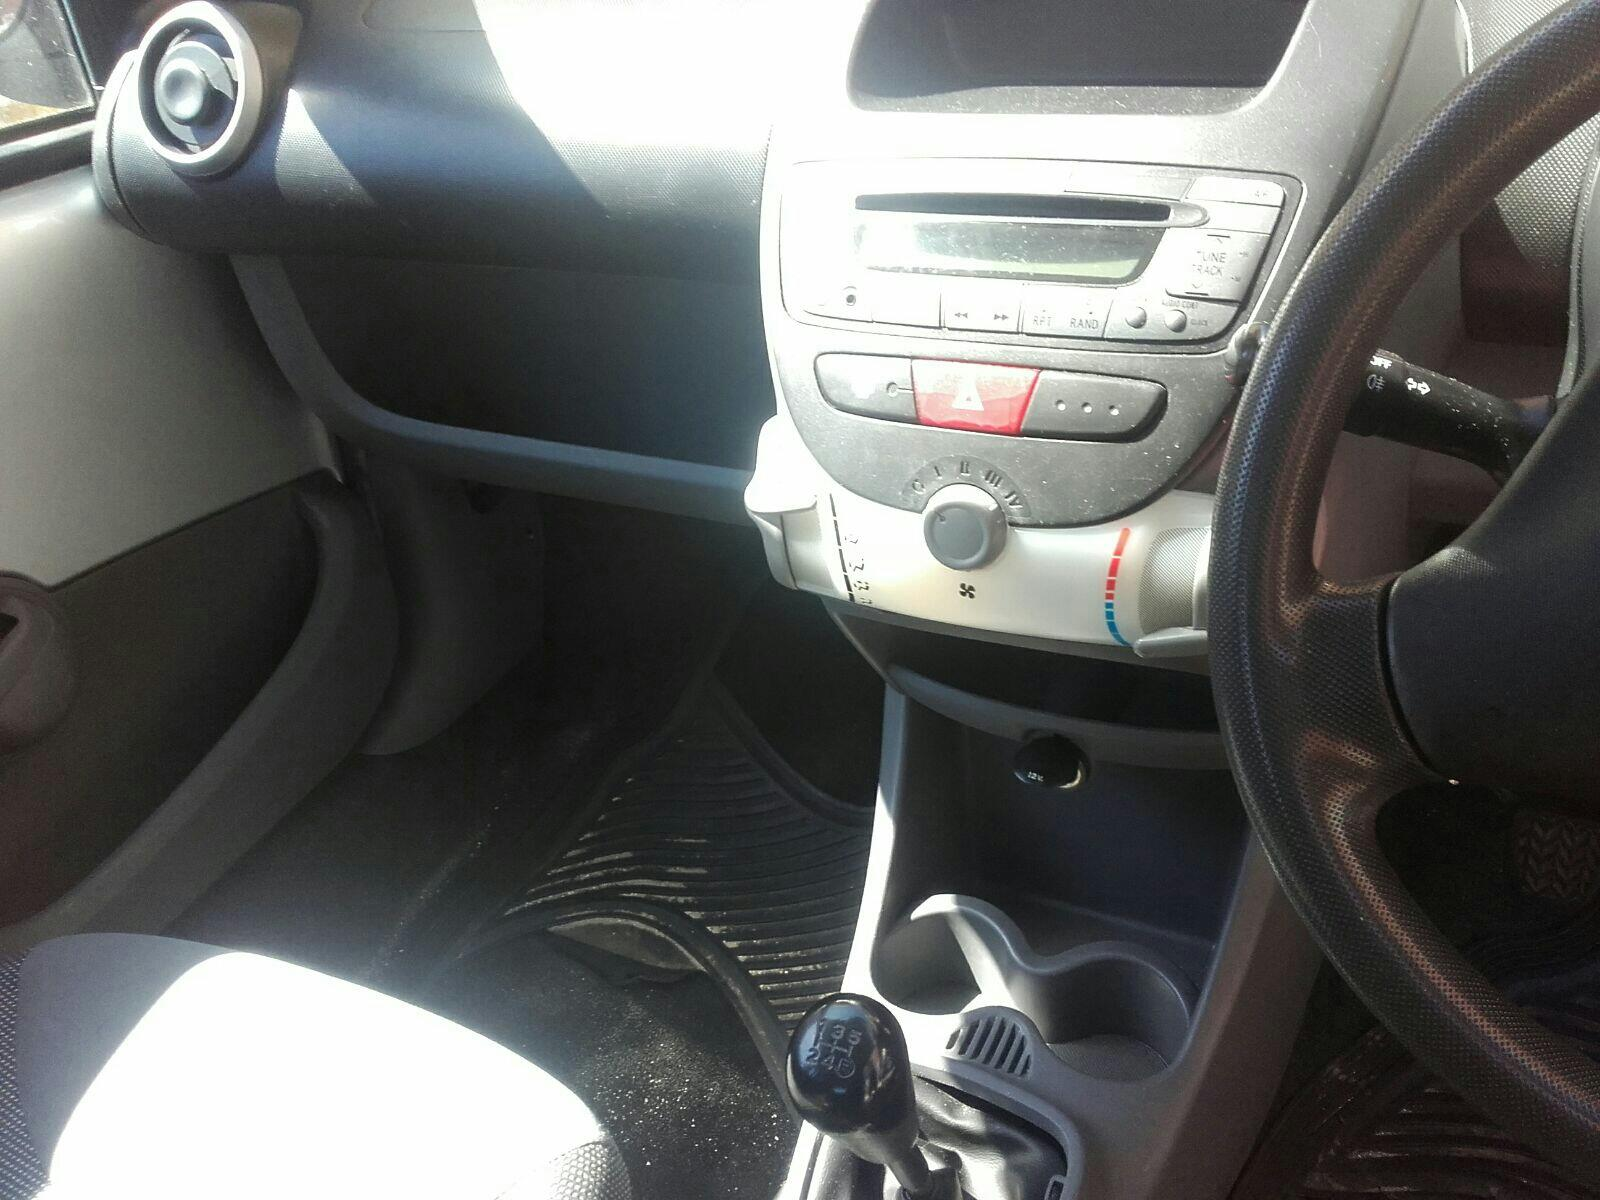 hight resolution of peugeot 107 2005 to 2008 urban 3 door hatchback scrap salvage car for sale